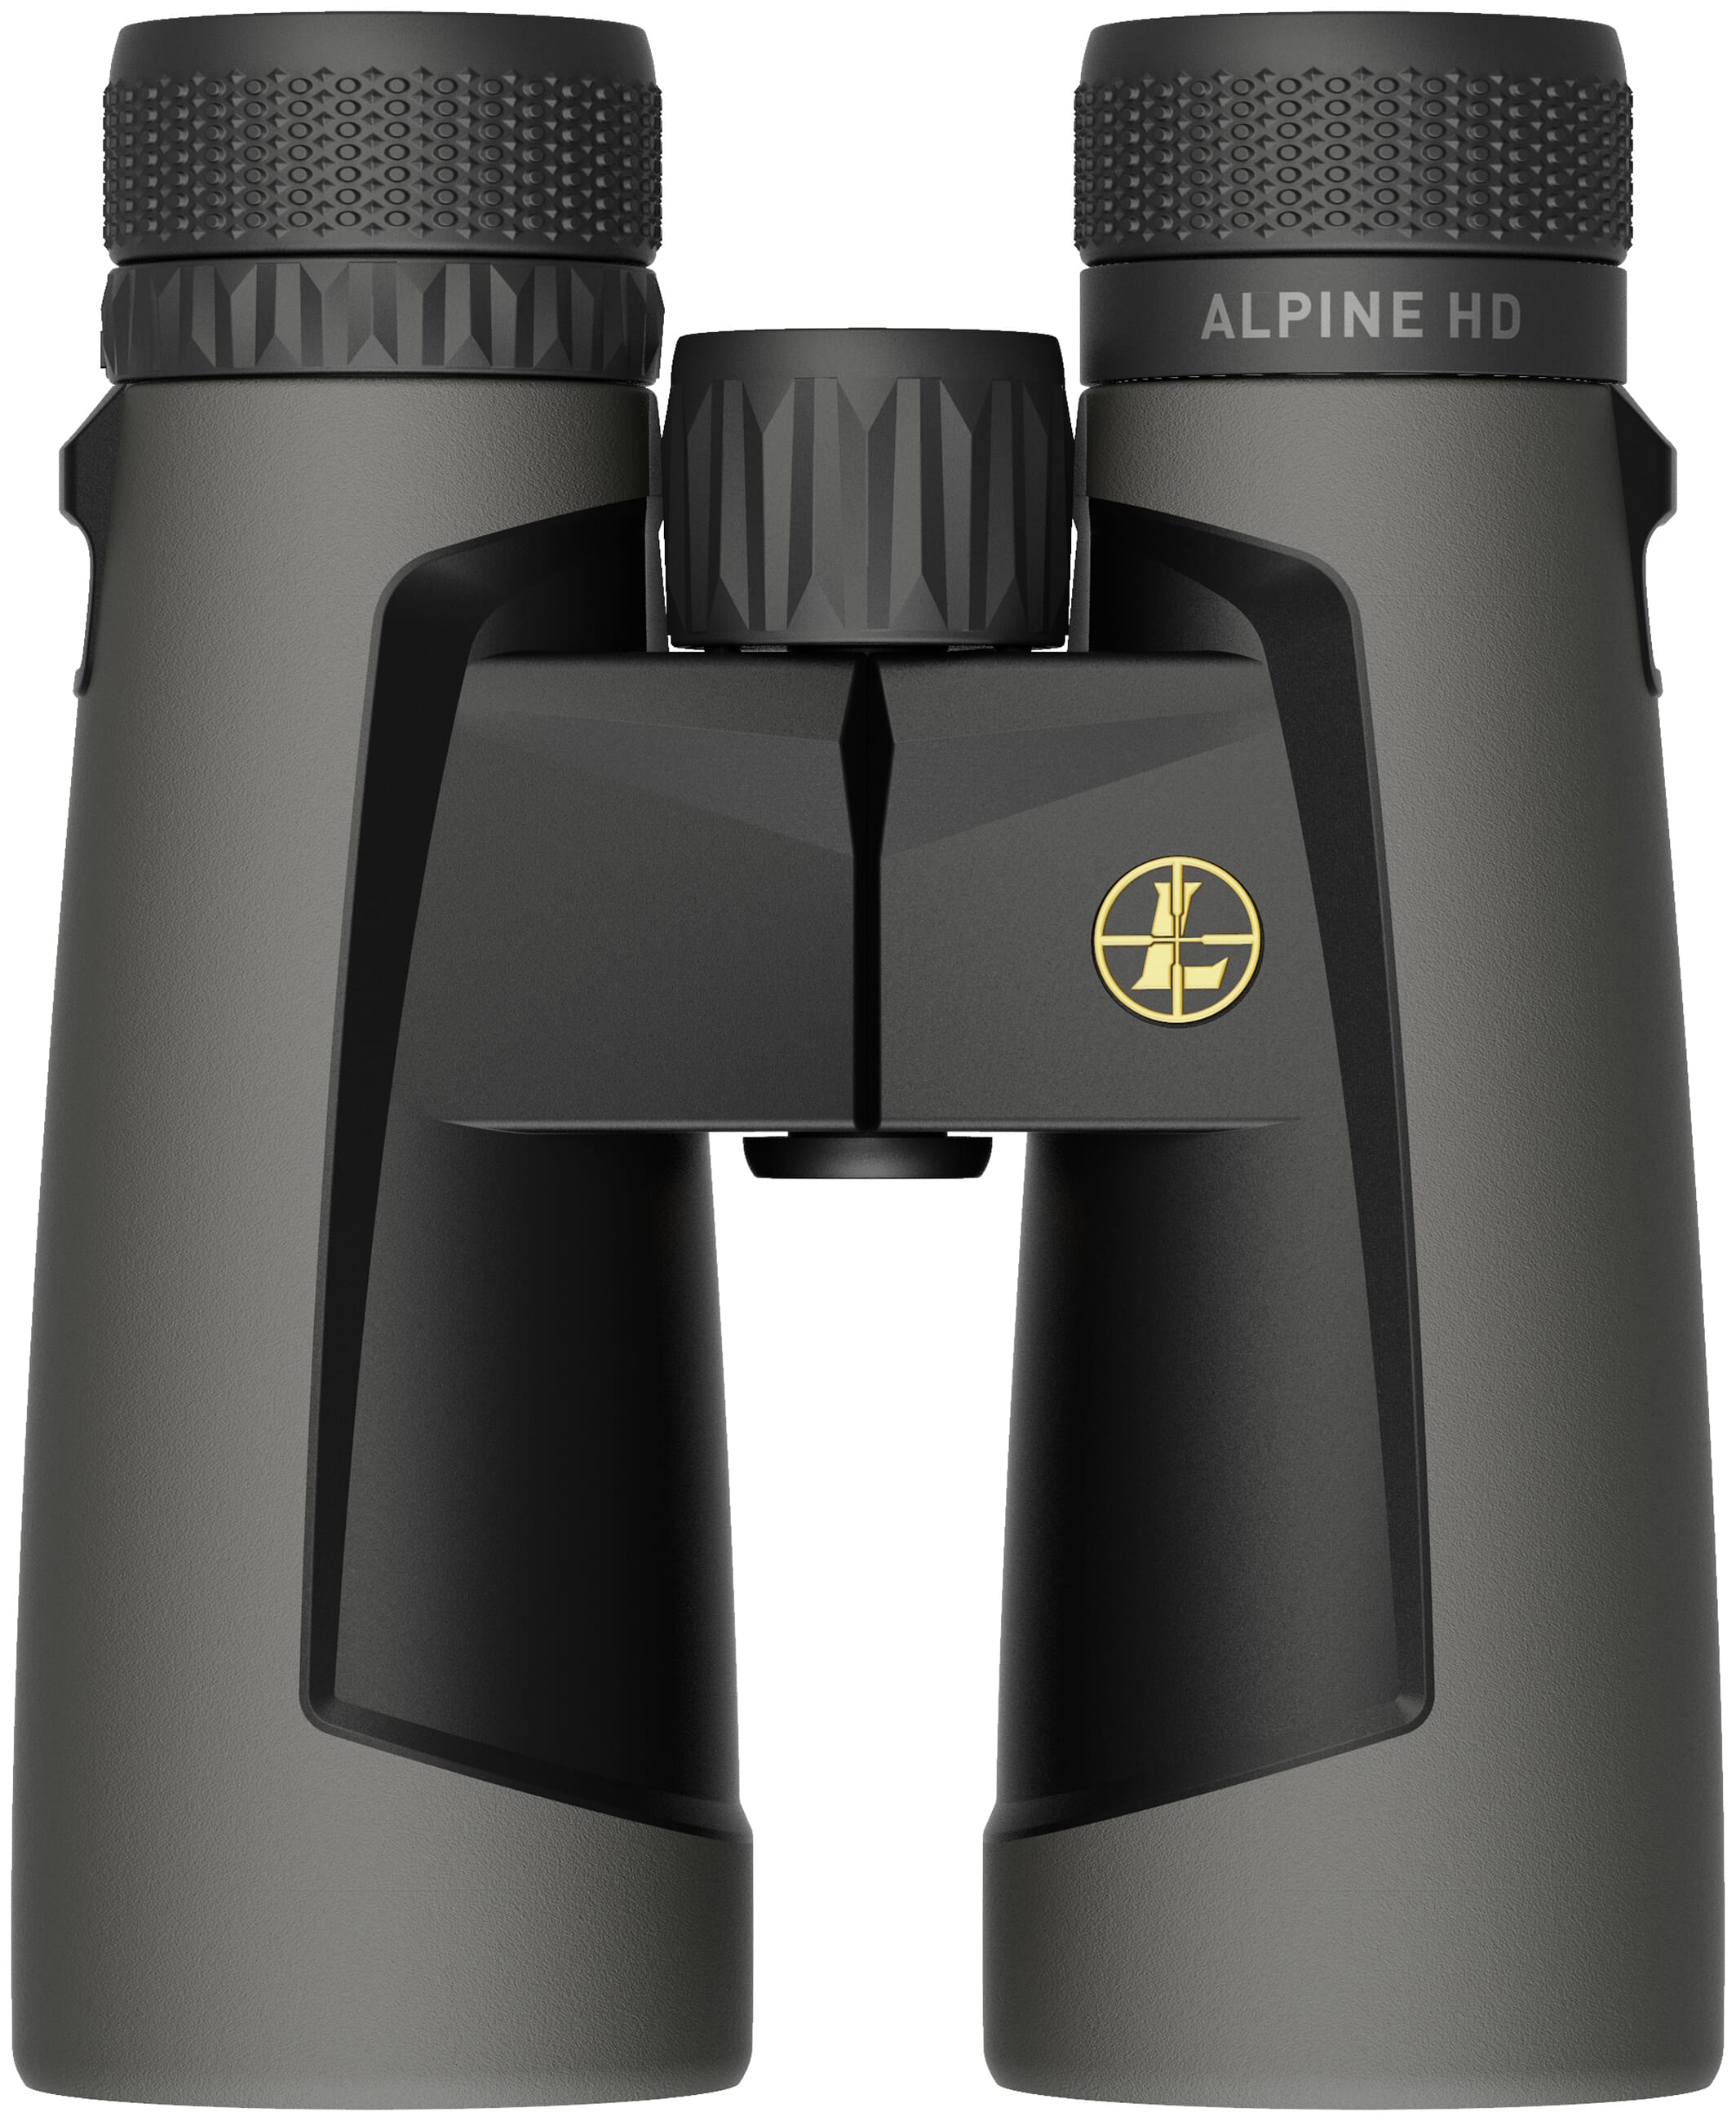 Leupold BX-2 Alpine HD 10x52mm Roof Shadow Gray Binoculars 181178